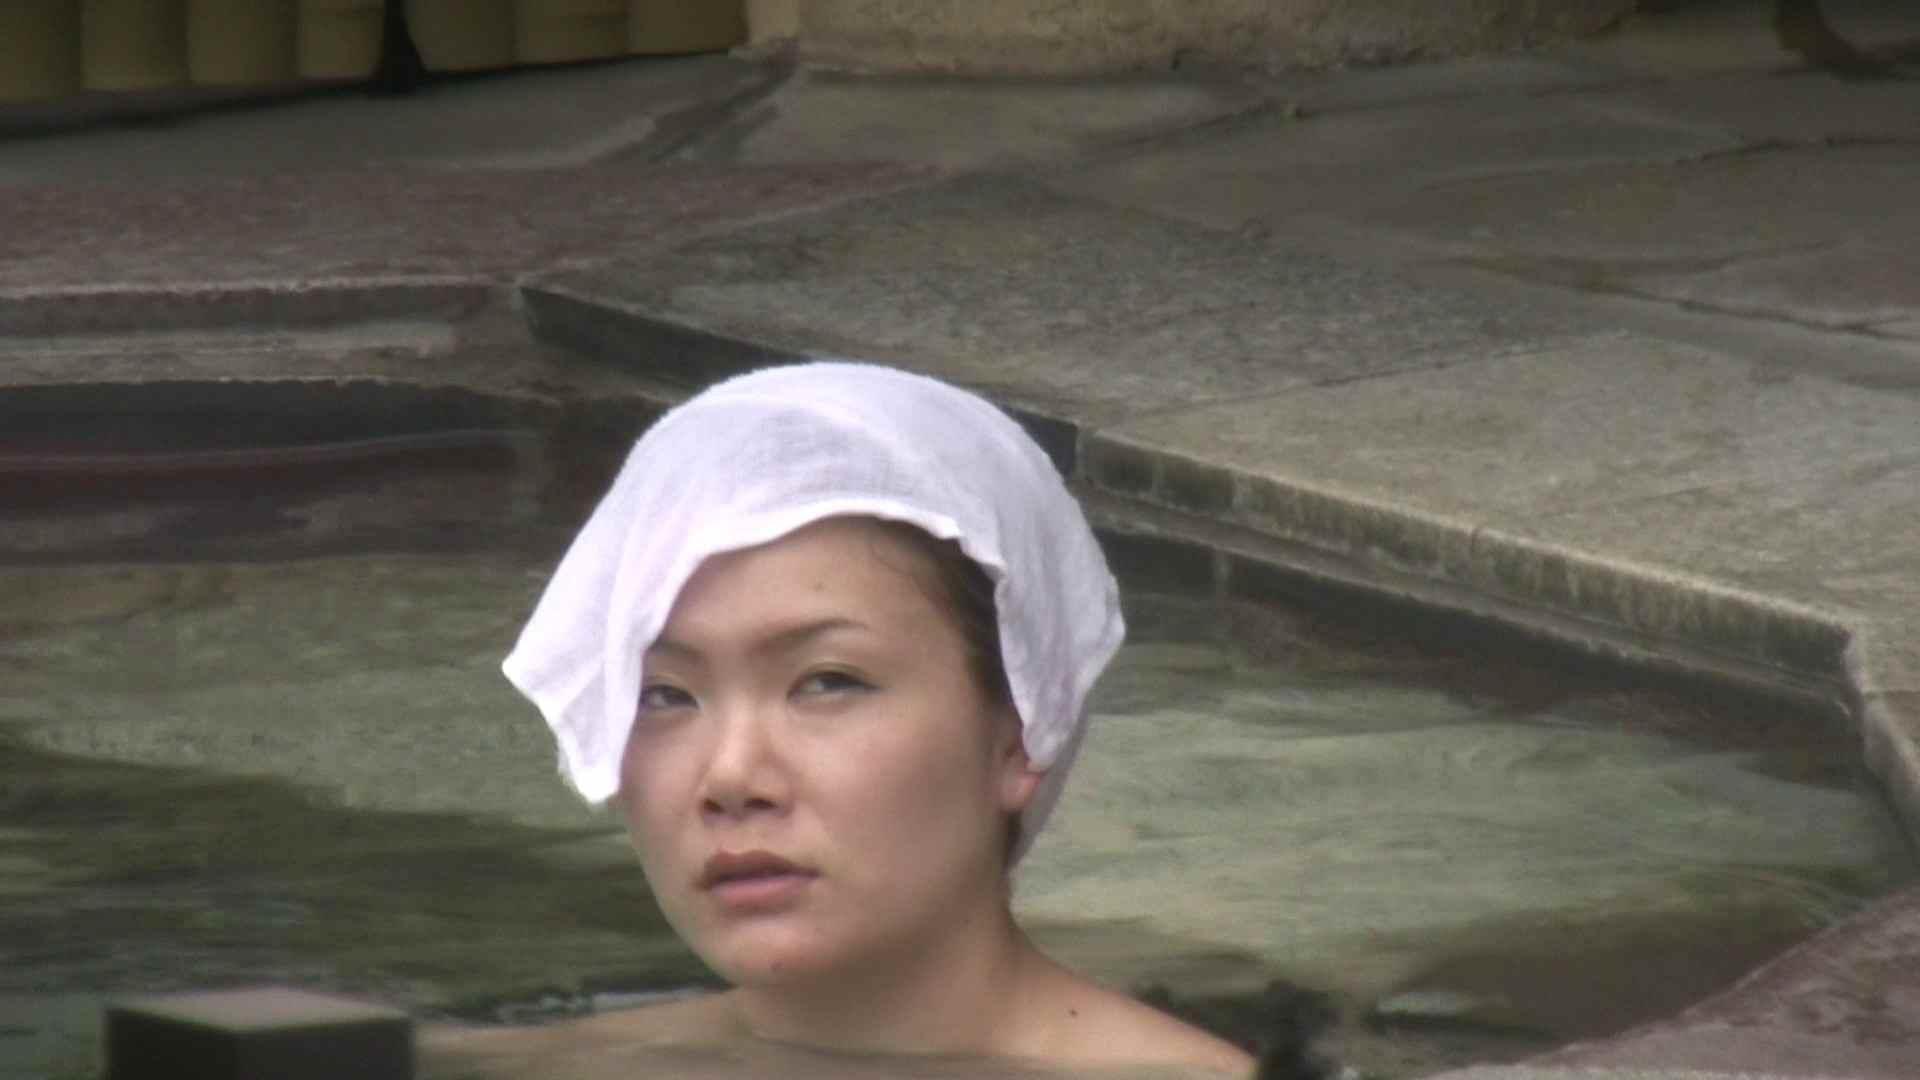 Aquaな露天風呂Vol.12【VIP】 HなOL | 盗撮  83pic 79